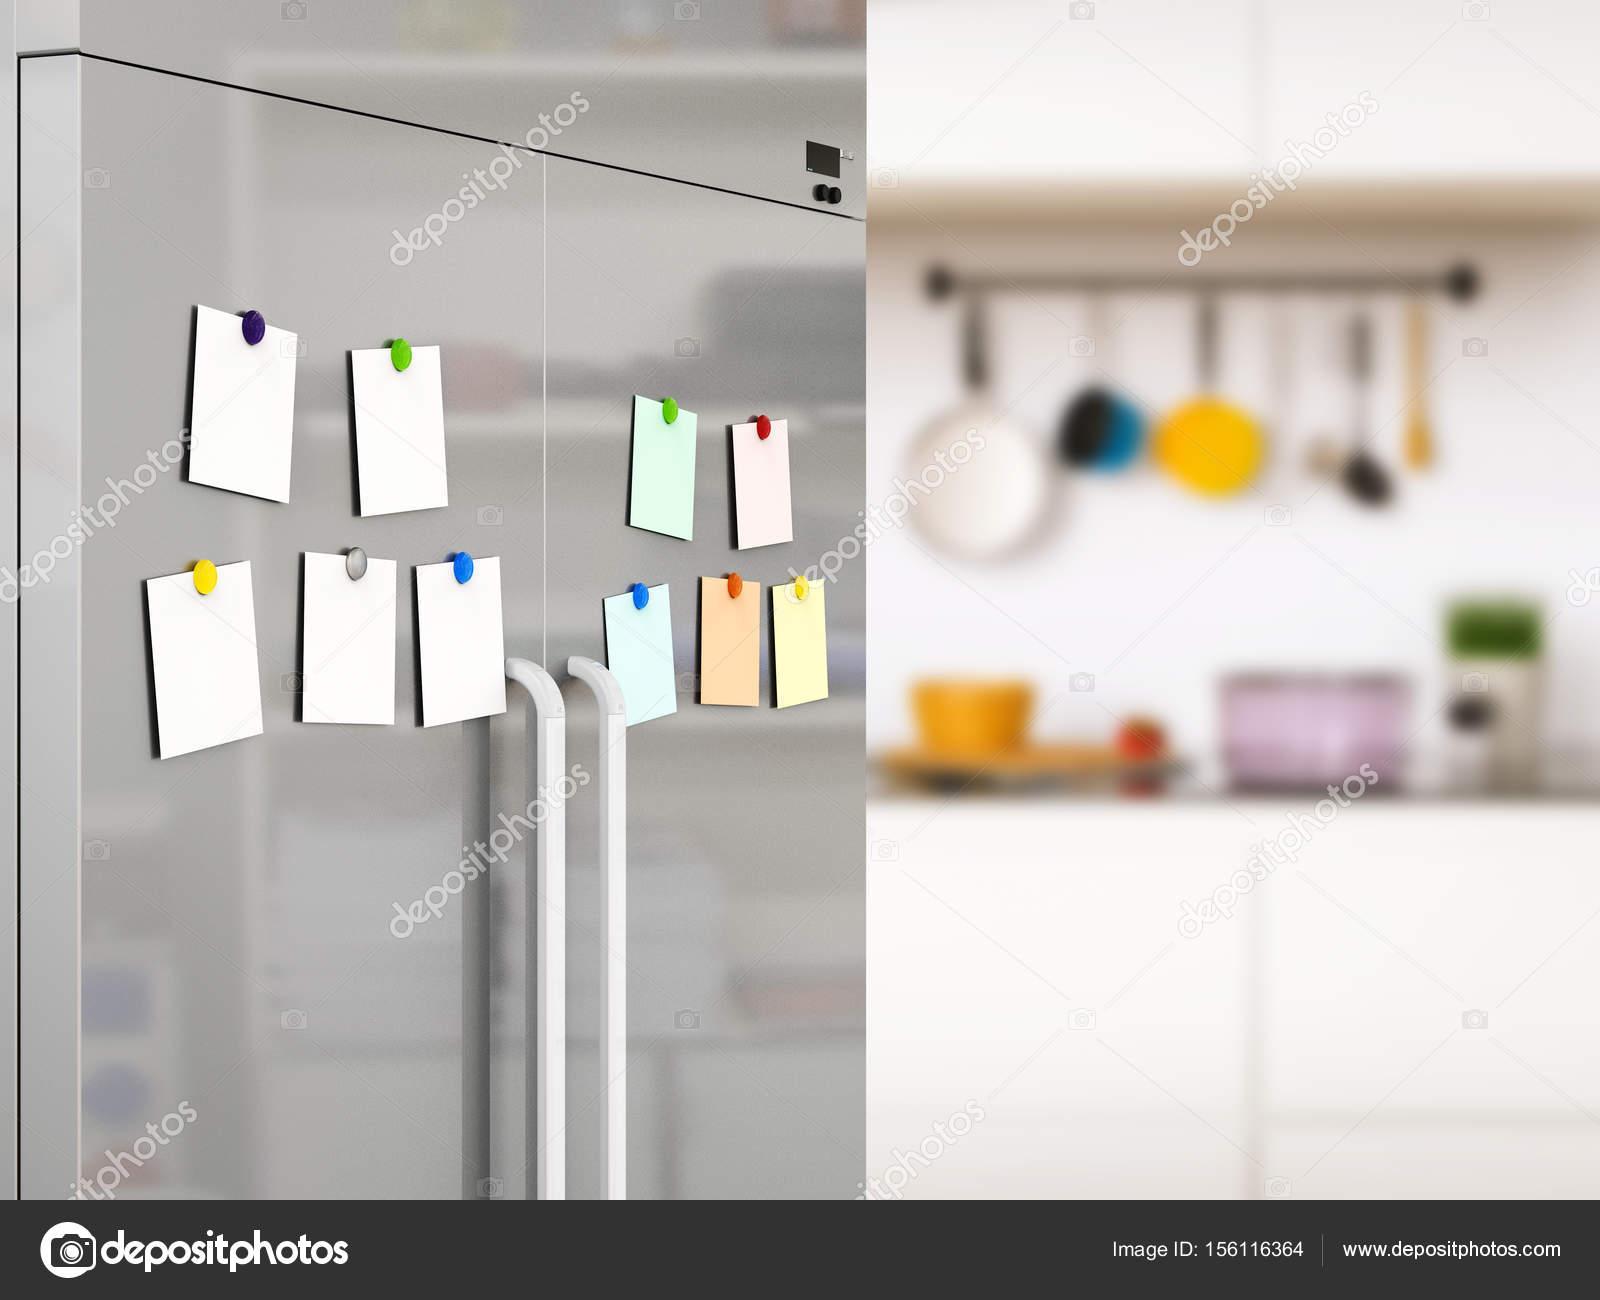 Kühlschrank Magnete : Leere notizen mit kühlschrank magnete u2014 stockfoto © phonlamai #156116364